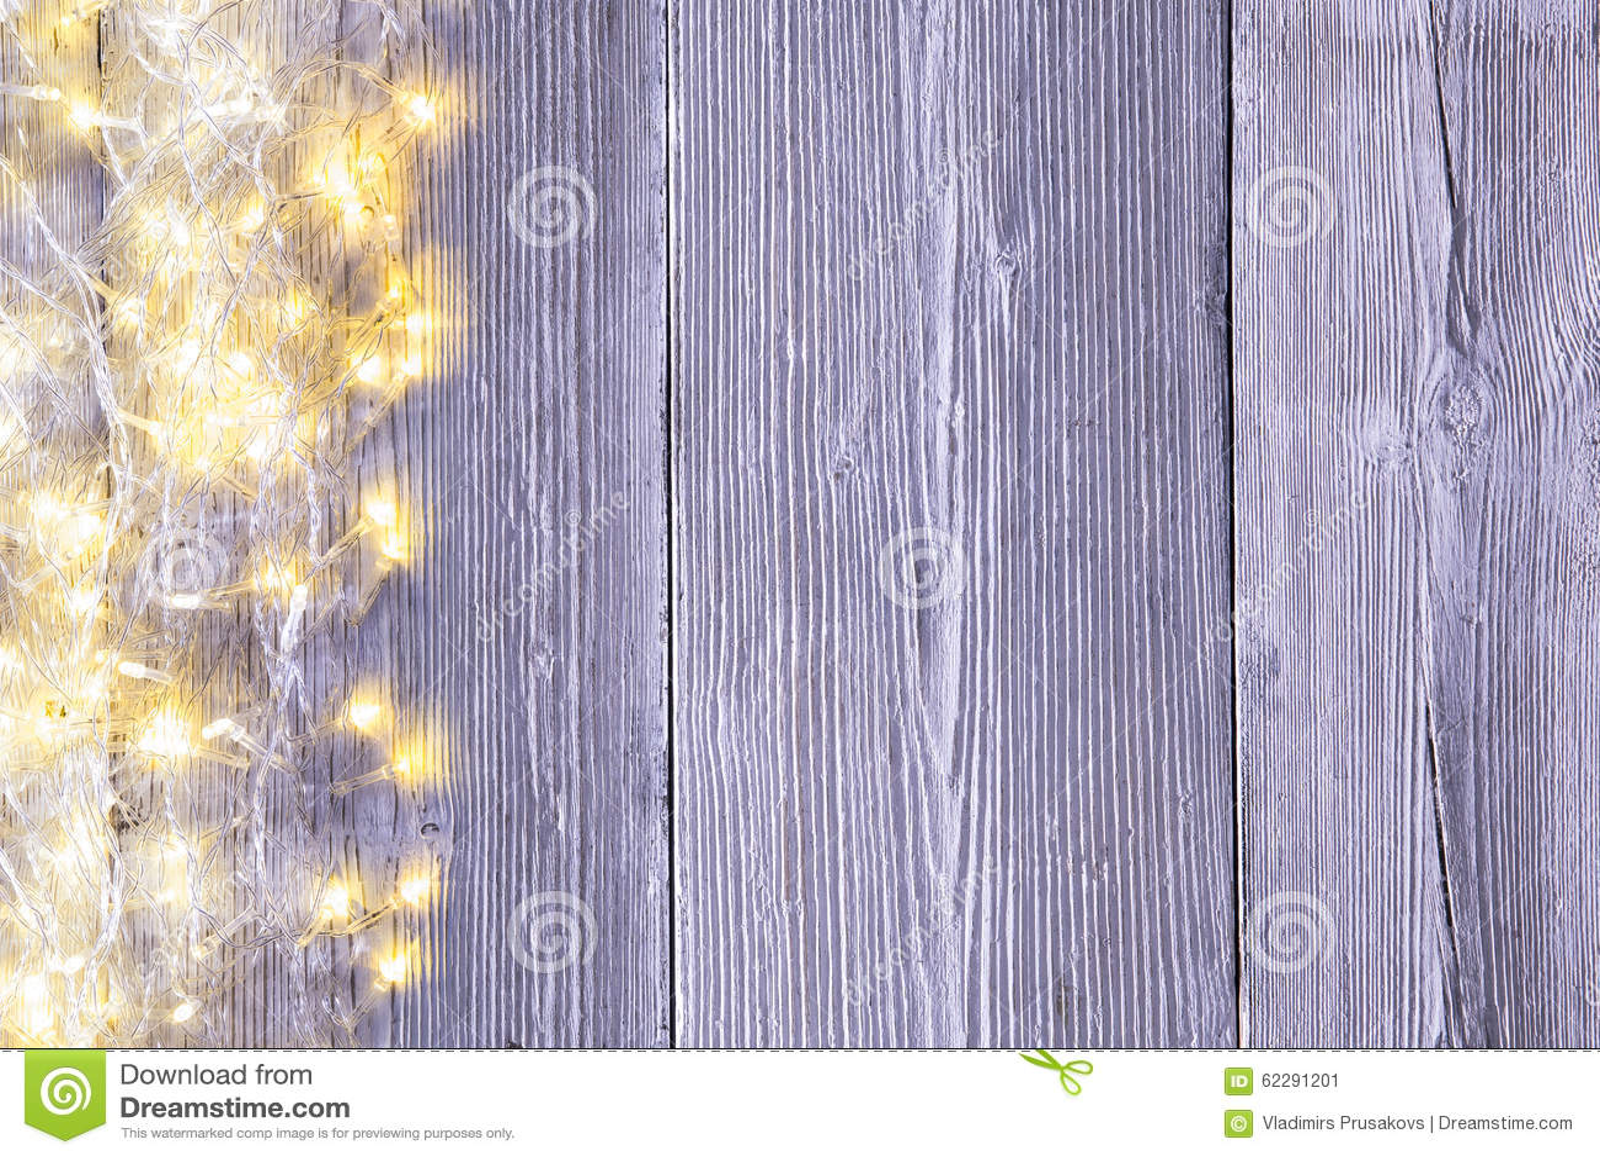 Garland Lights Wood Background, textura del tablero de madera de la luz